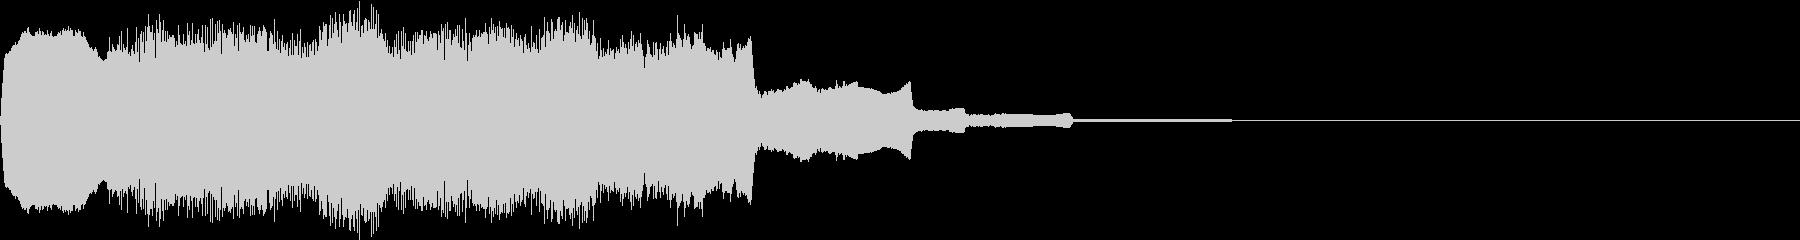 DOREMI ドレミ音階 キラキラFX3の未再生の波形